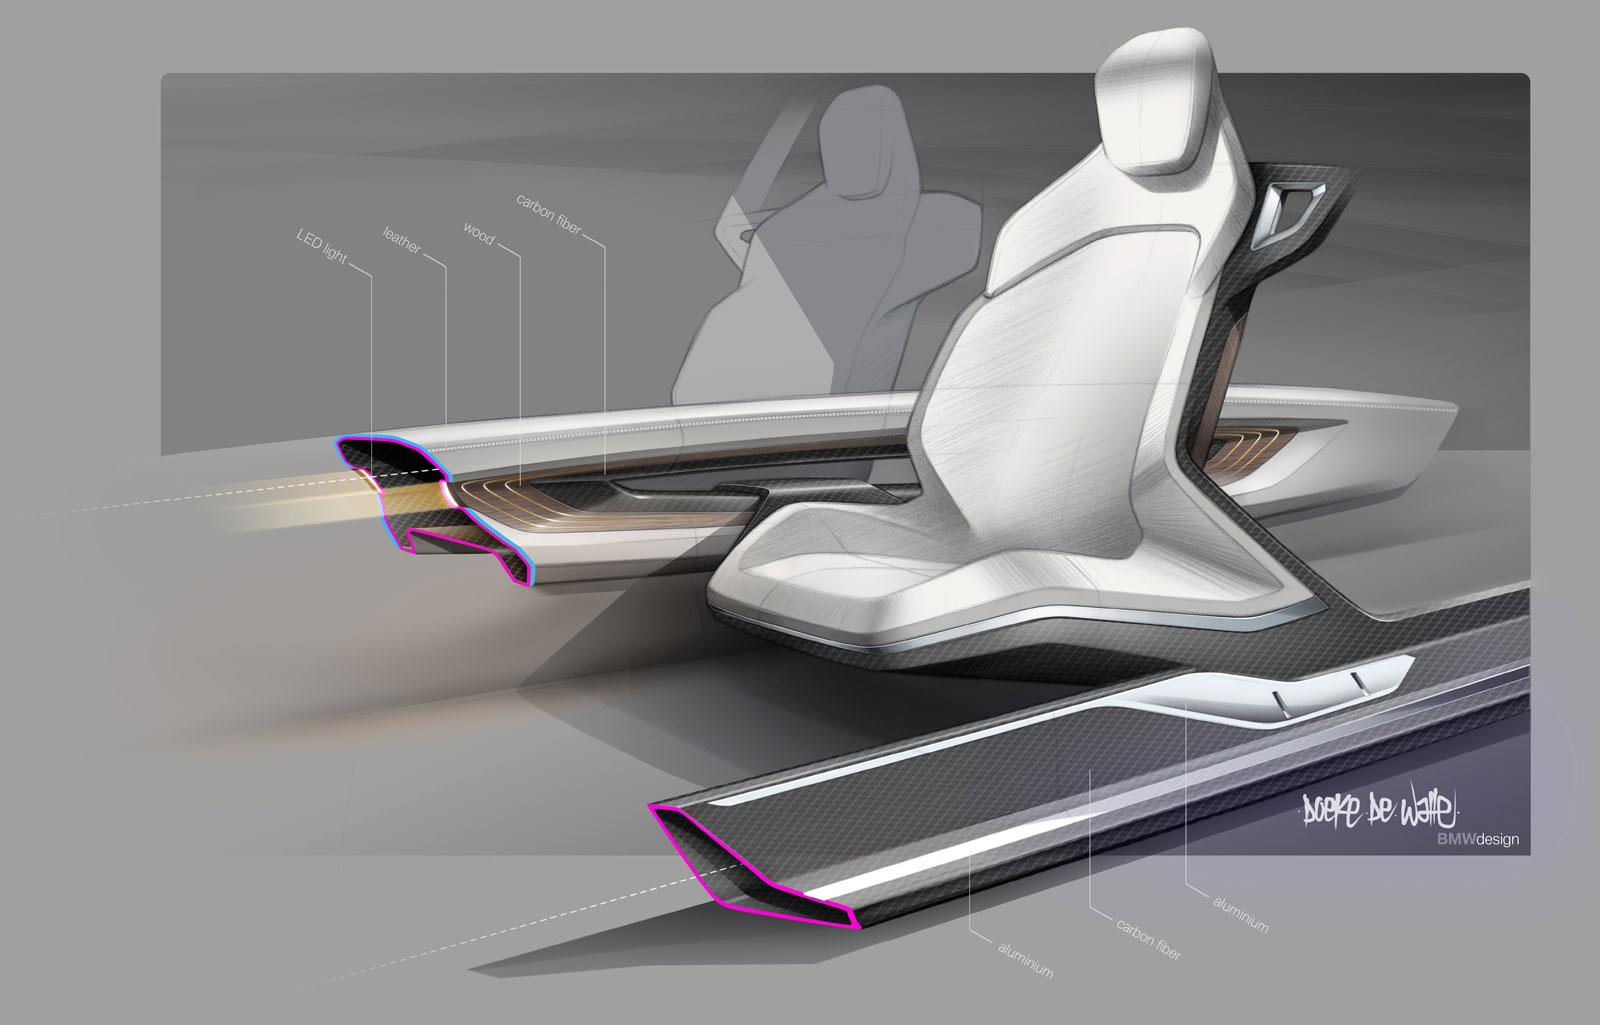 Bmw Vision Future Luxury Concept Interior Design Sketch